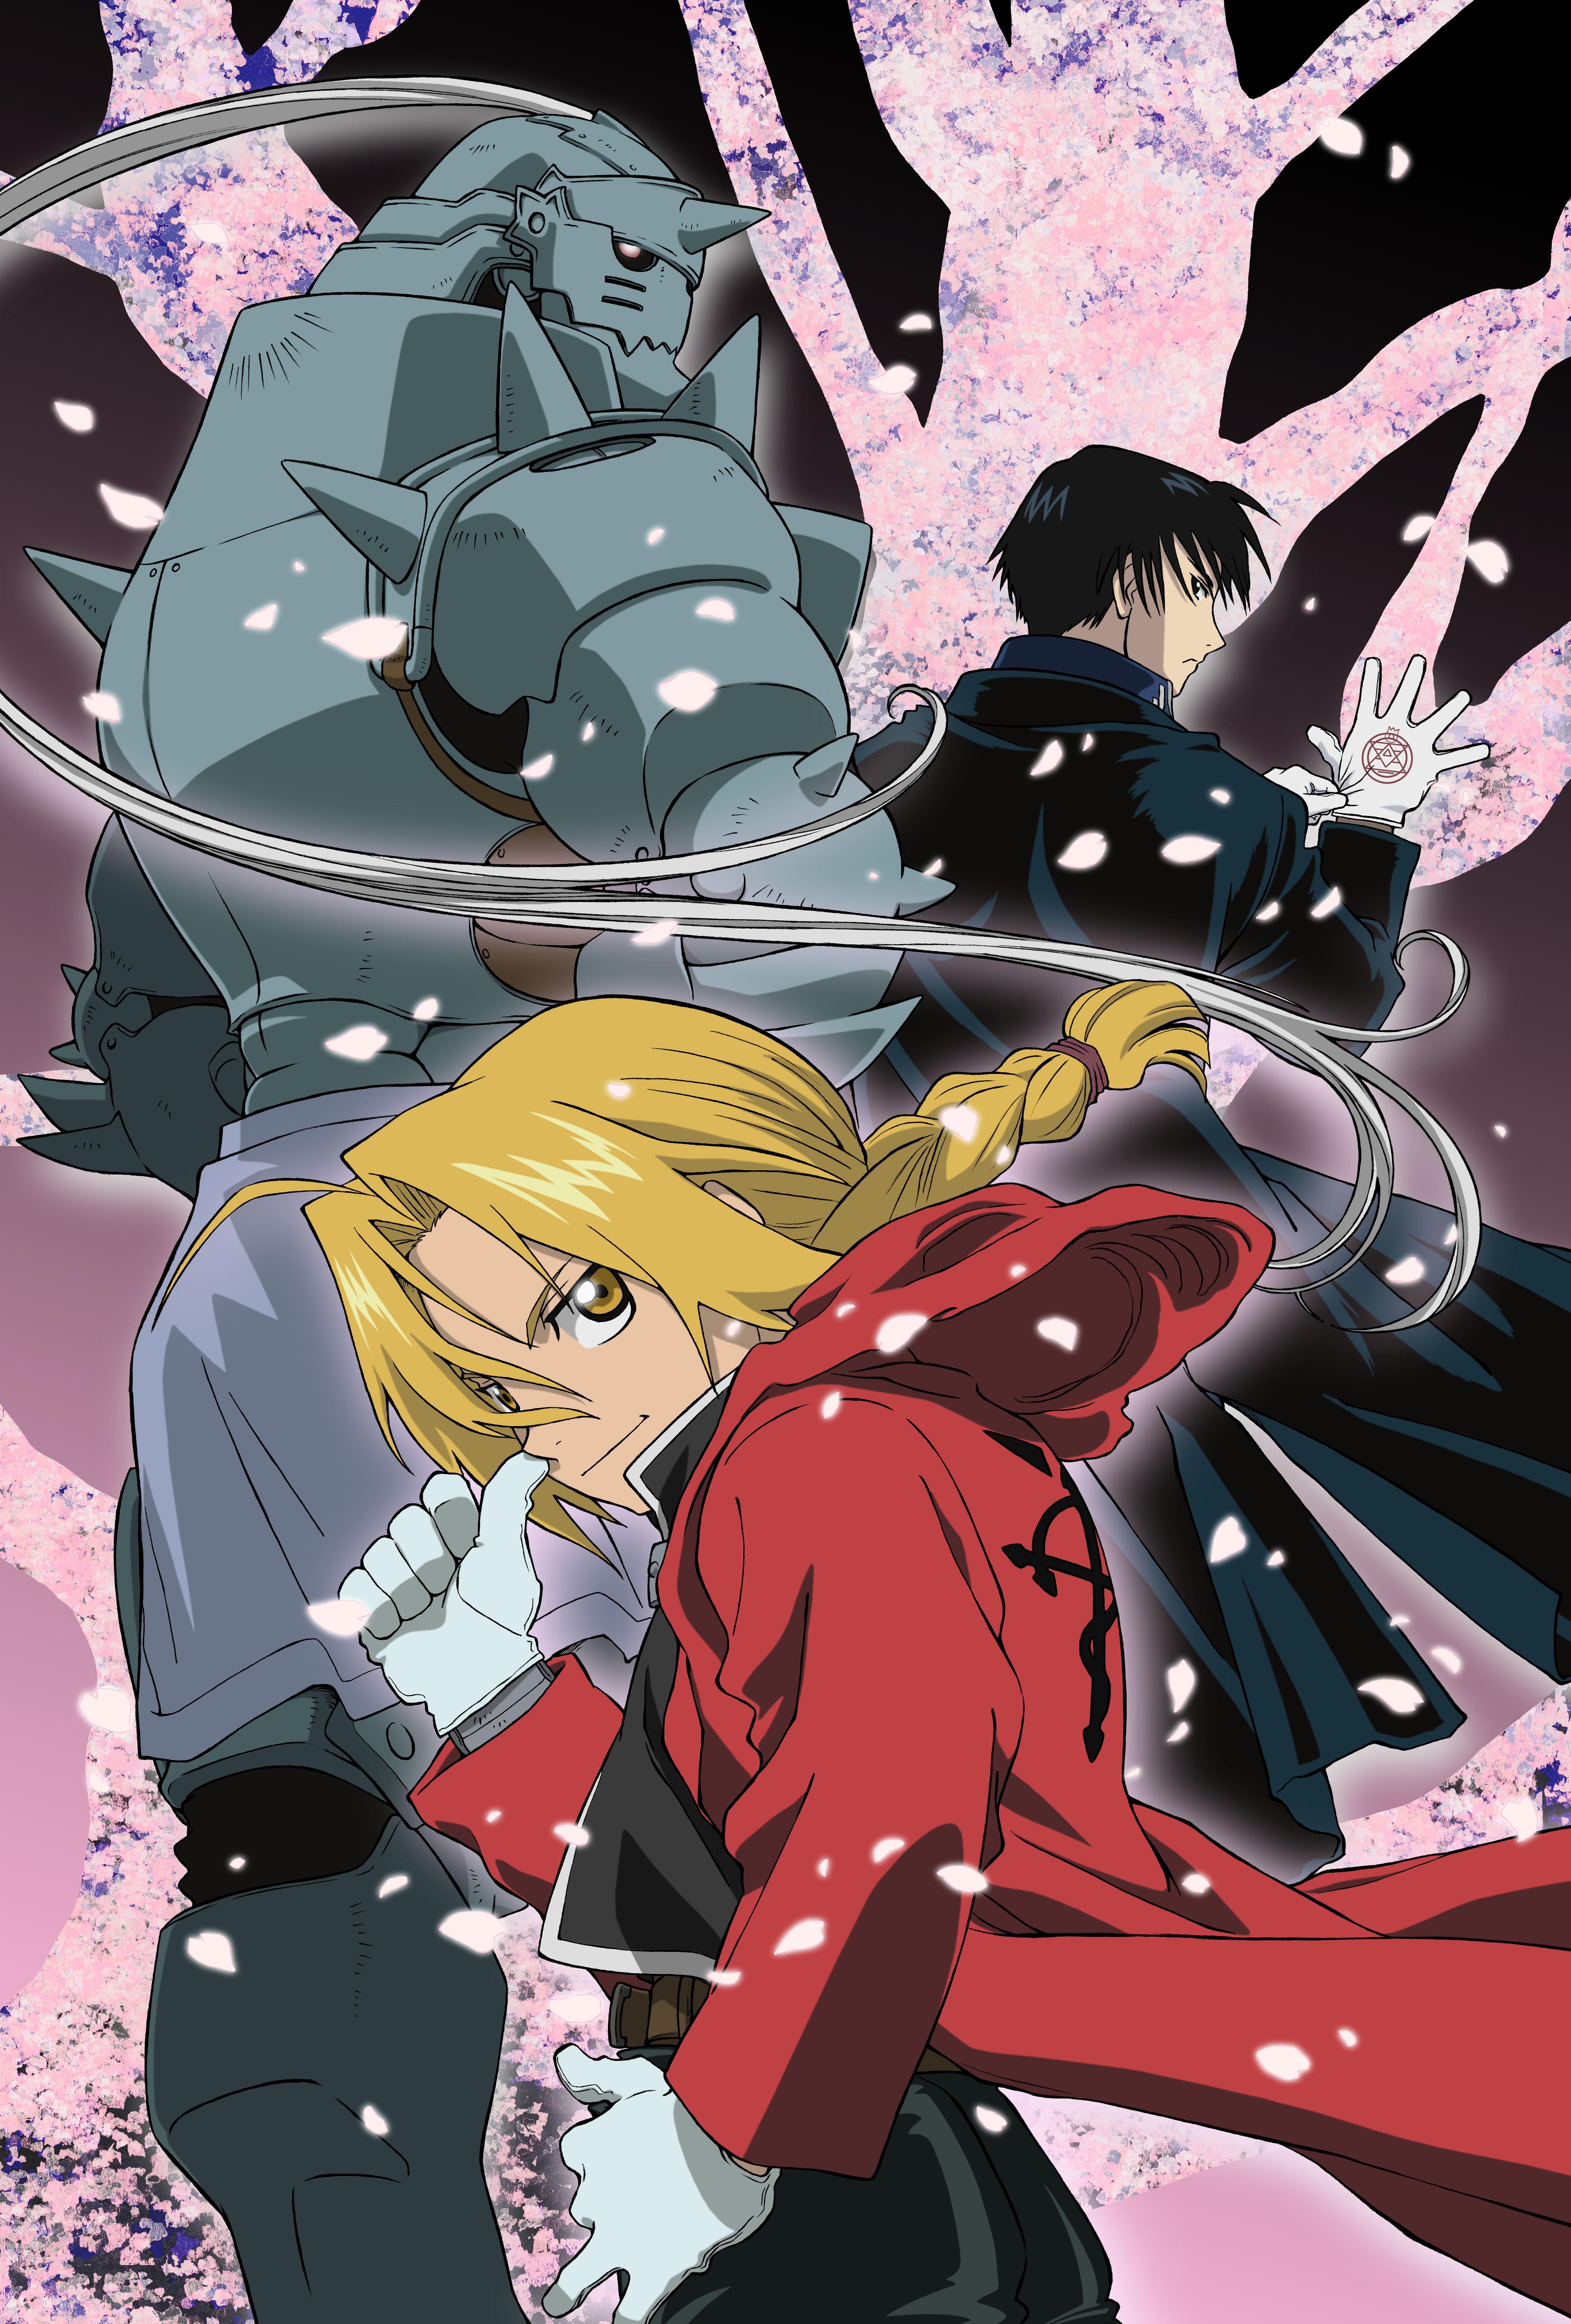 Aurochs/Anime - Japari Library, the Kemono Friends Wiki